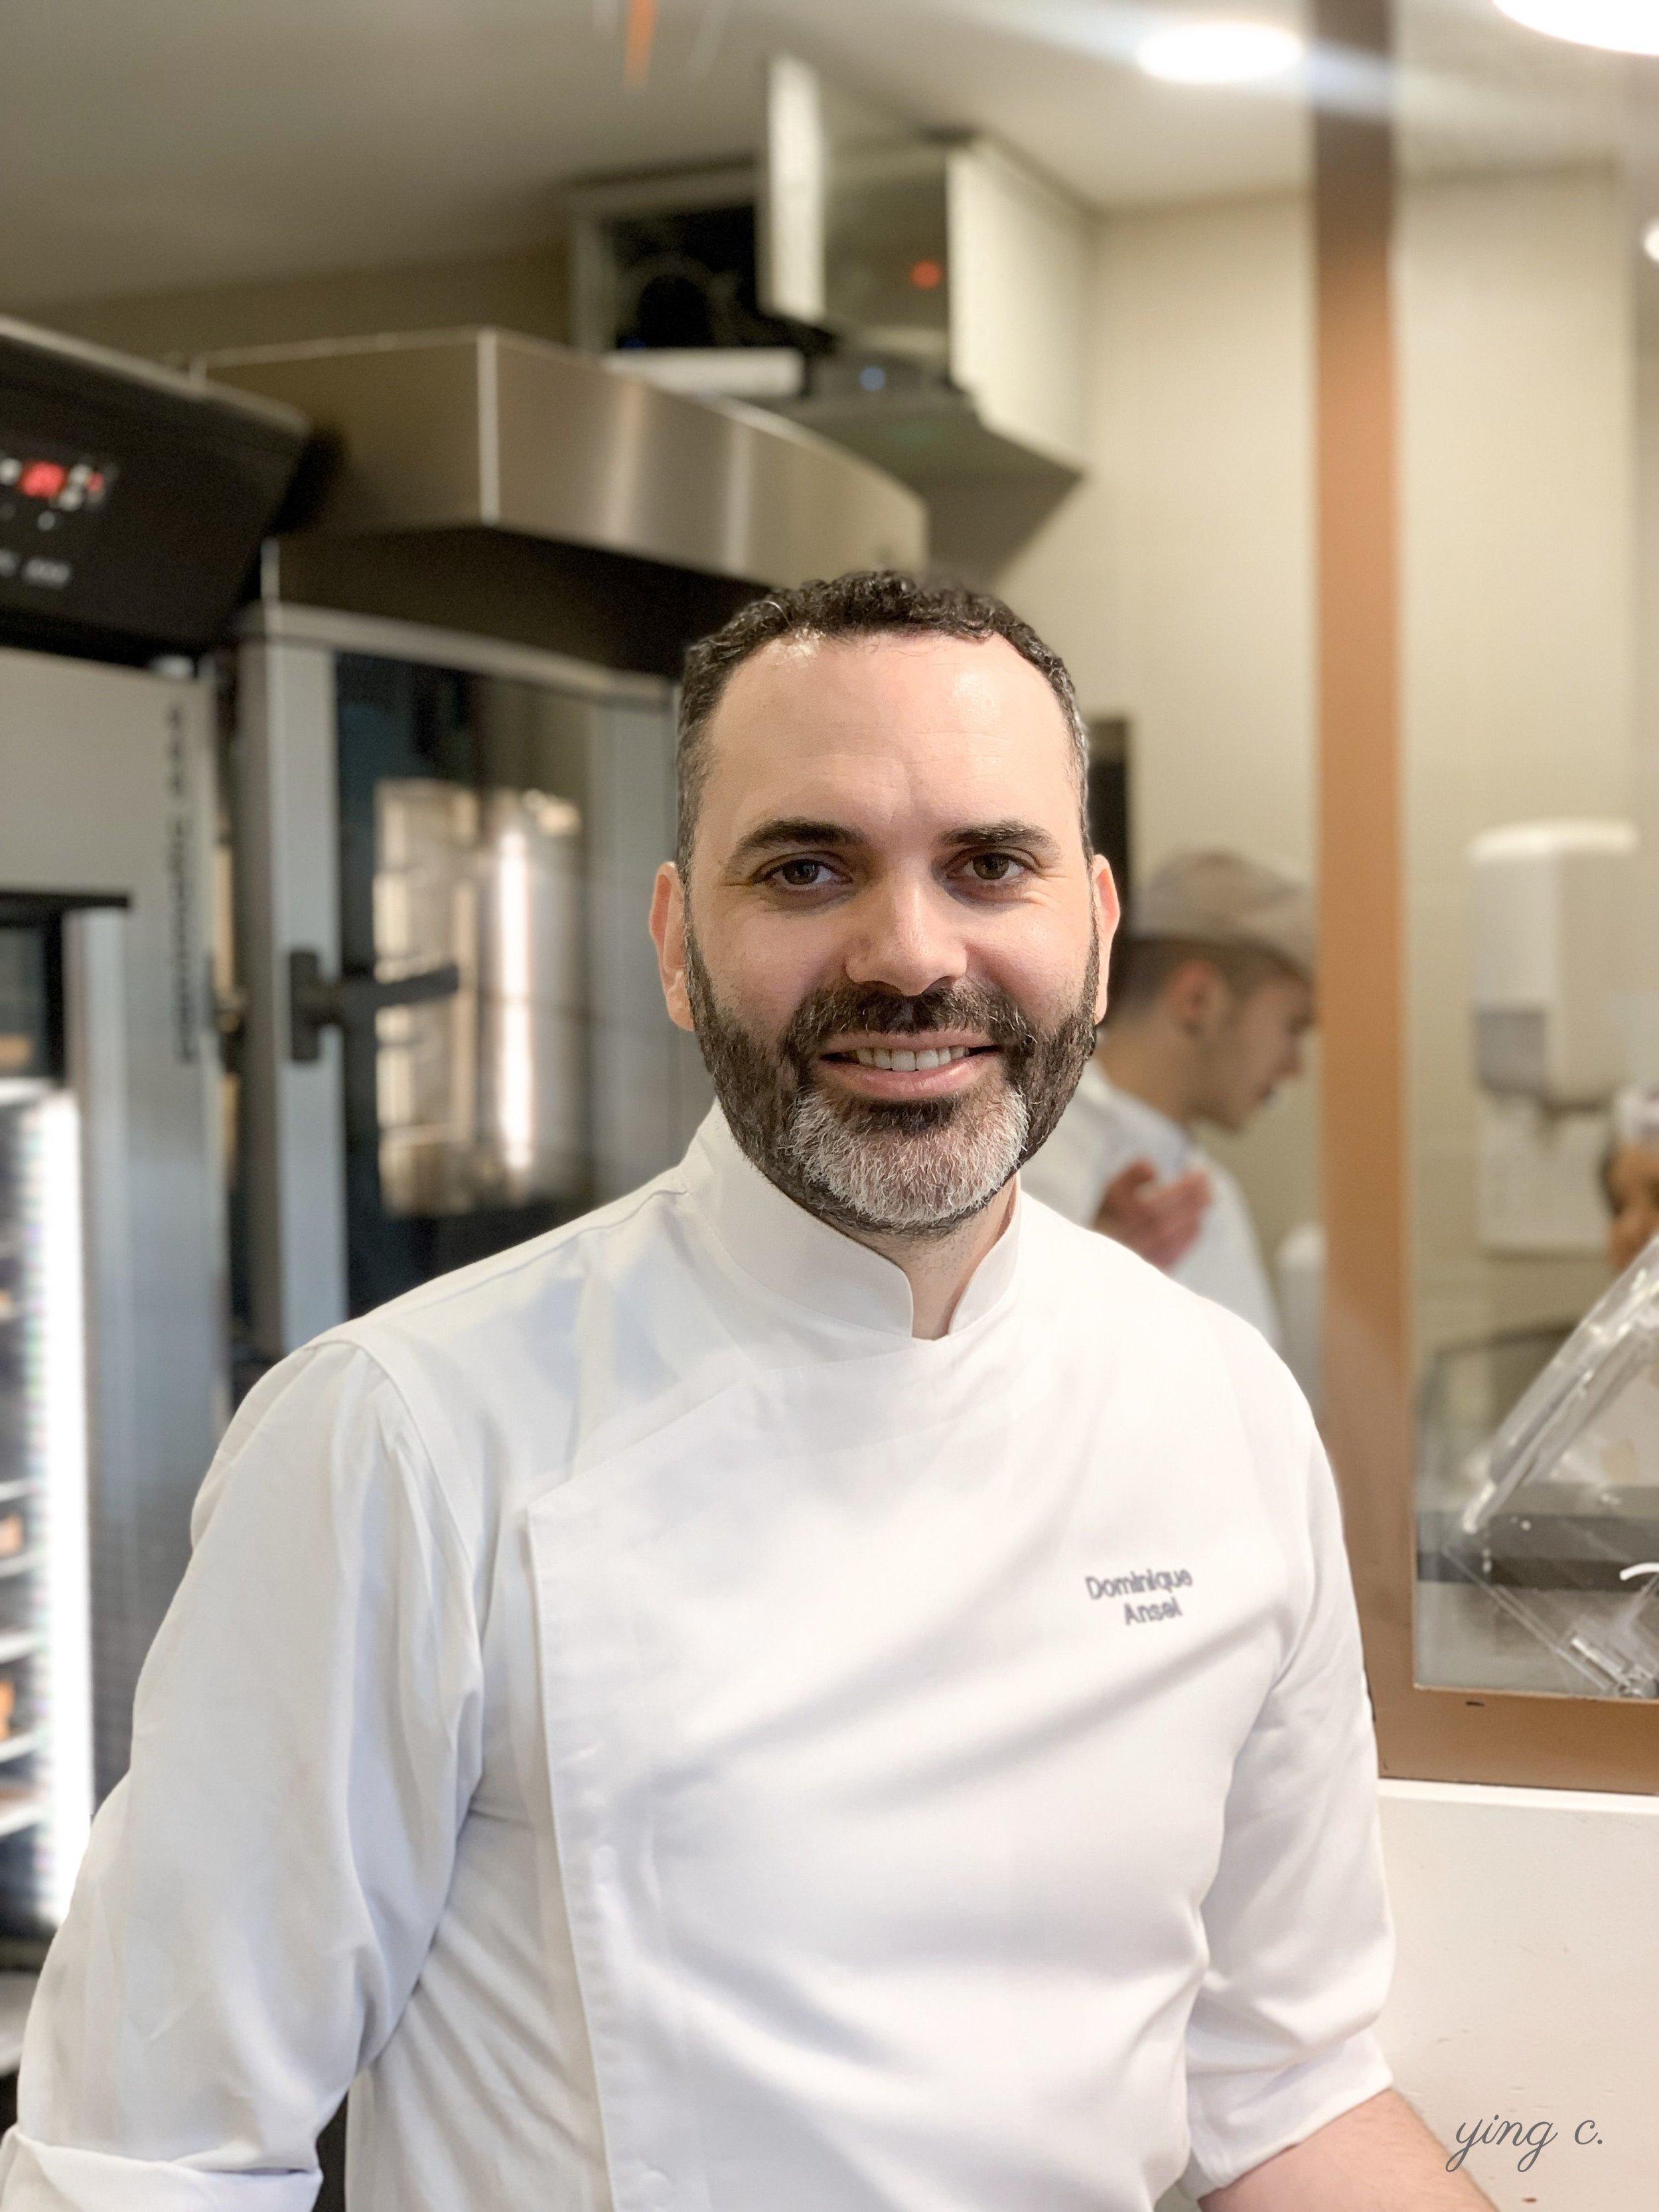 今年五月應邀至 Yann Couvreur 甜點店客座的  Dominique Ansel  主廚。